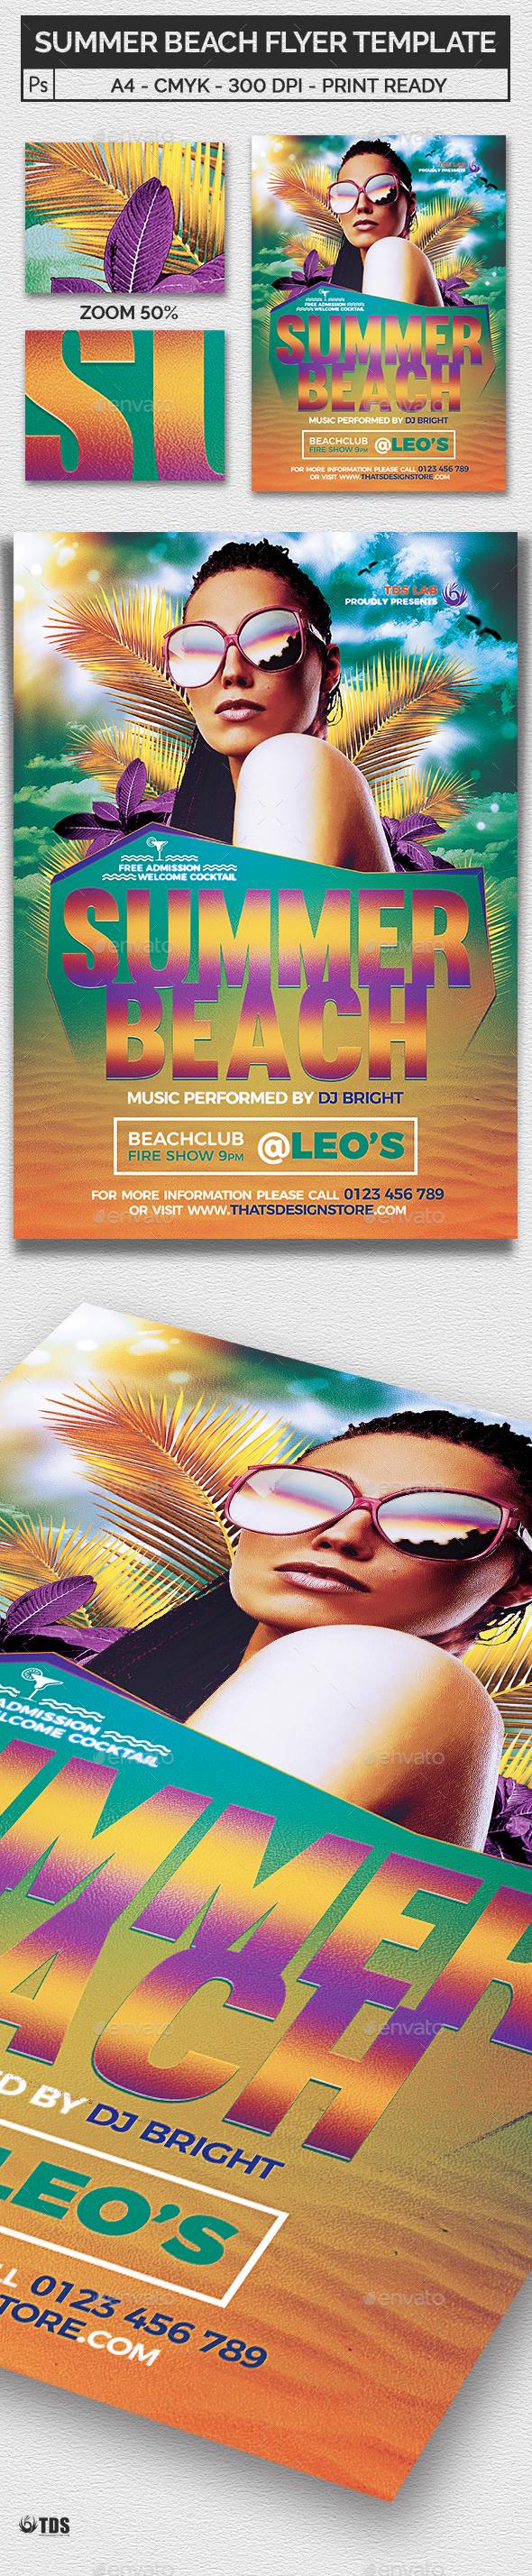 Summer Beach Flyer Template V1 - Clubs & Parties Events